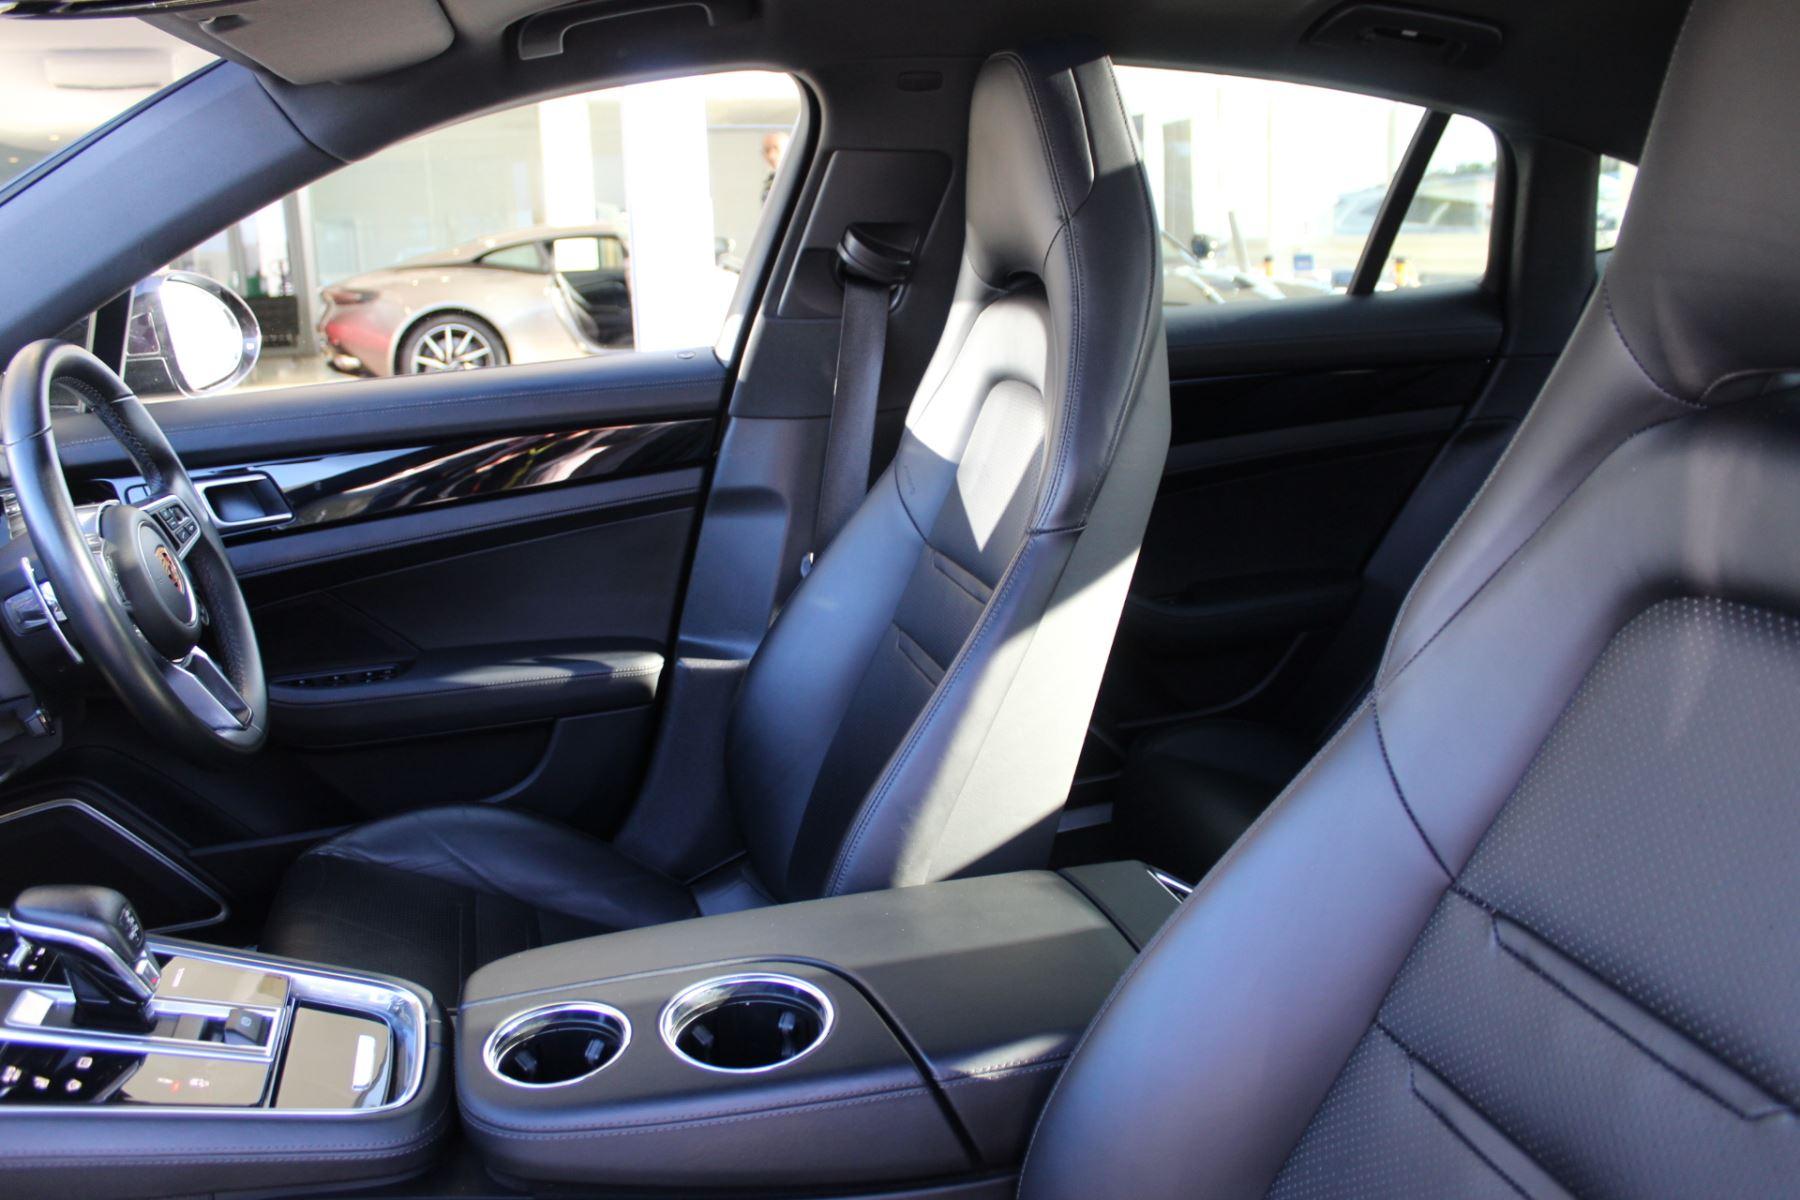 Porsche Panamera 2.9 V6 4 E-Hybrid PDK image 8